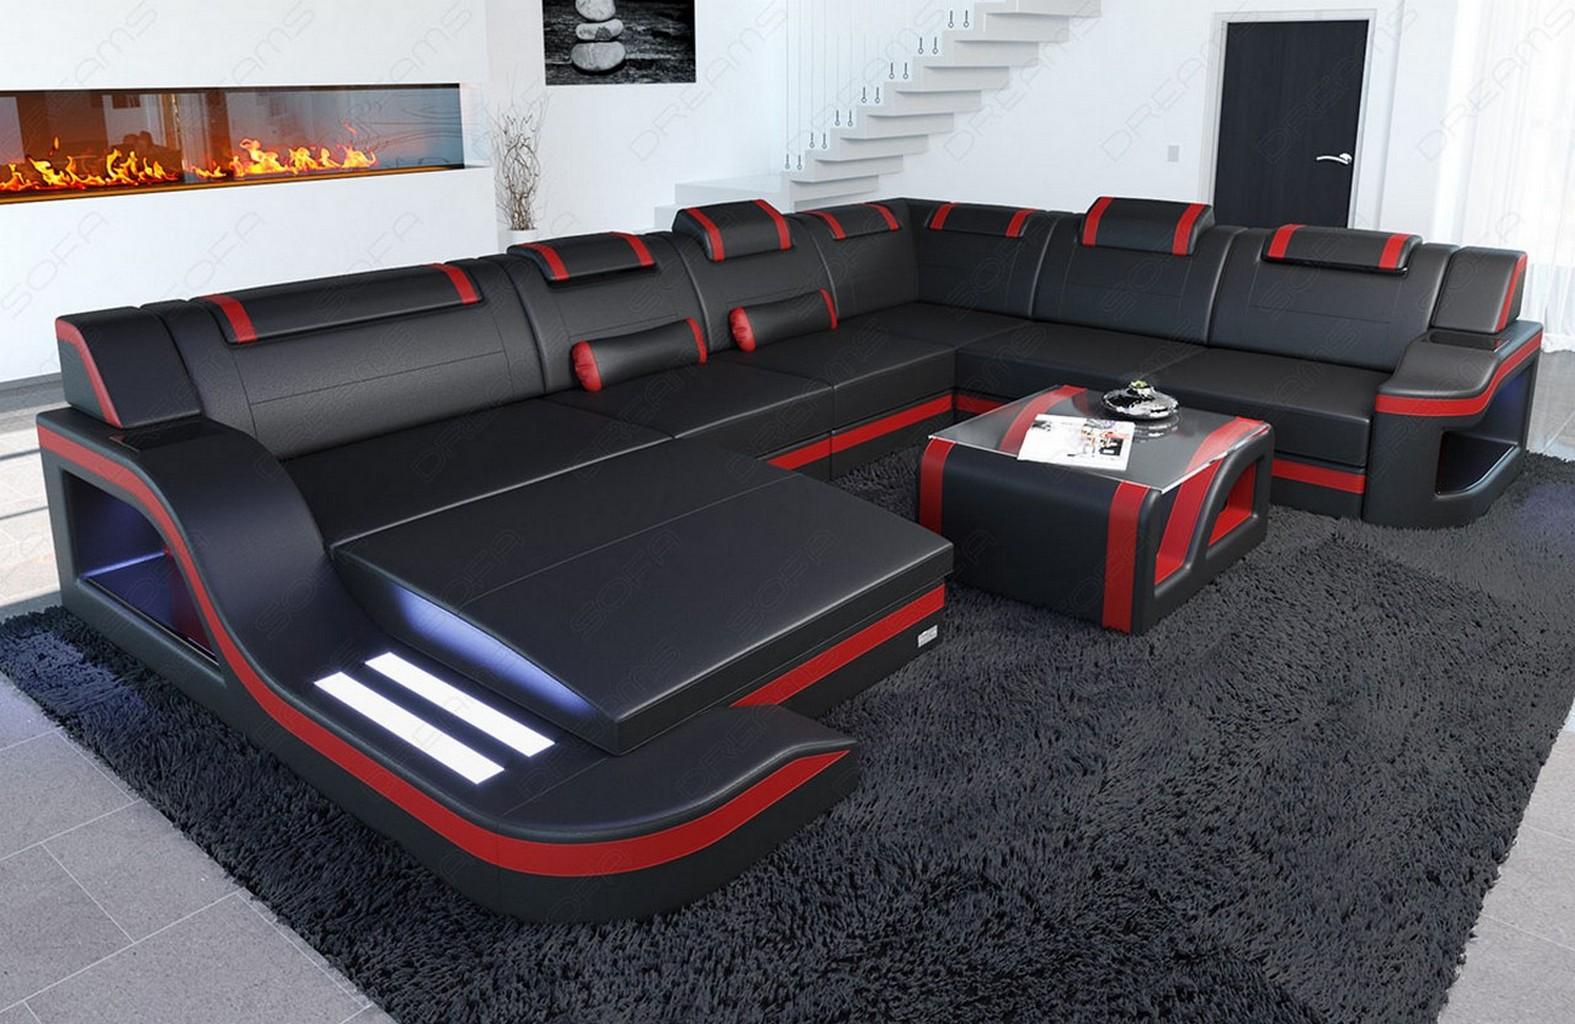 sofa palermo xxl mit led beleuchtung leder wohnlandschaft schwarz rot ebay. Black Bedroom Furniture Sets. Home Design Ideas